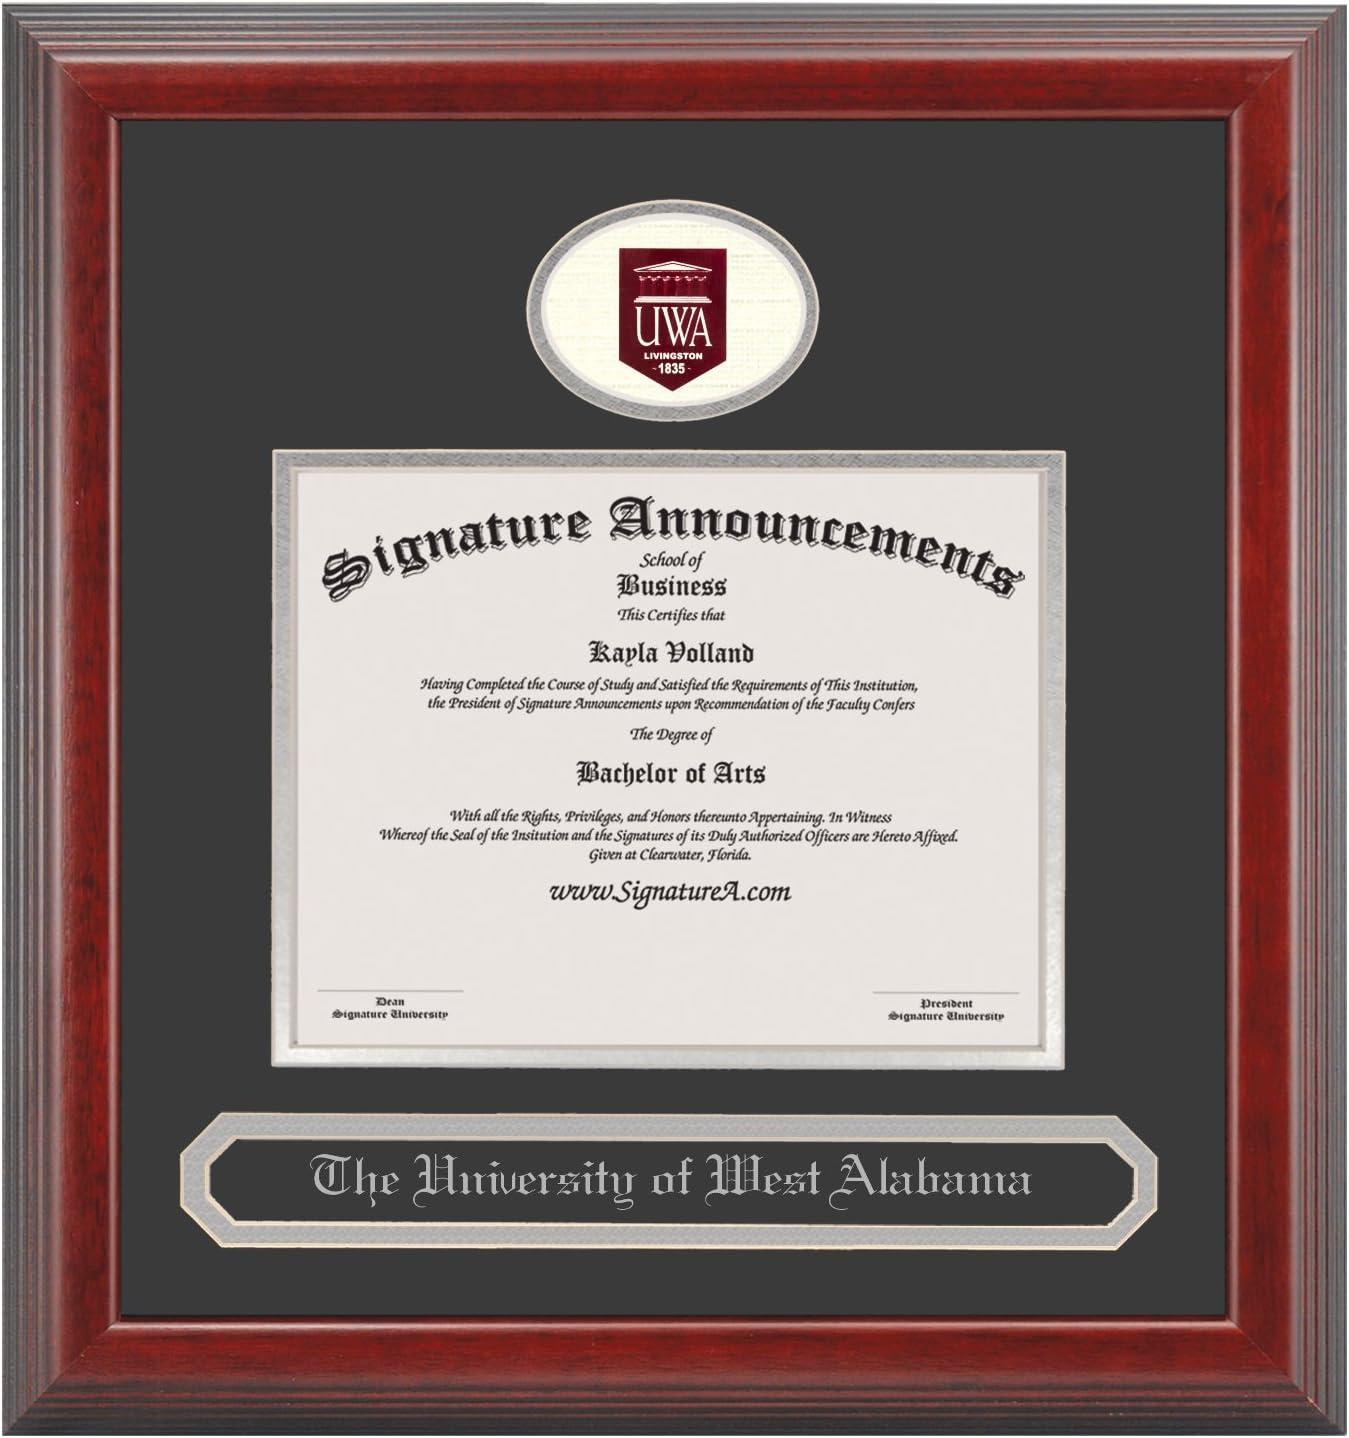 Professional//Doctor Sculpted Foil Seal /& Name Graduation Diploma Frame 16 x 16 Cherry Signature Announcements Western-Washington-University Undergraduate